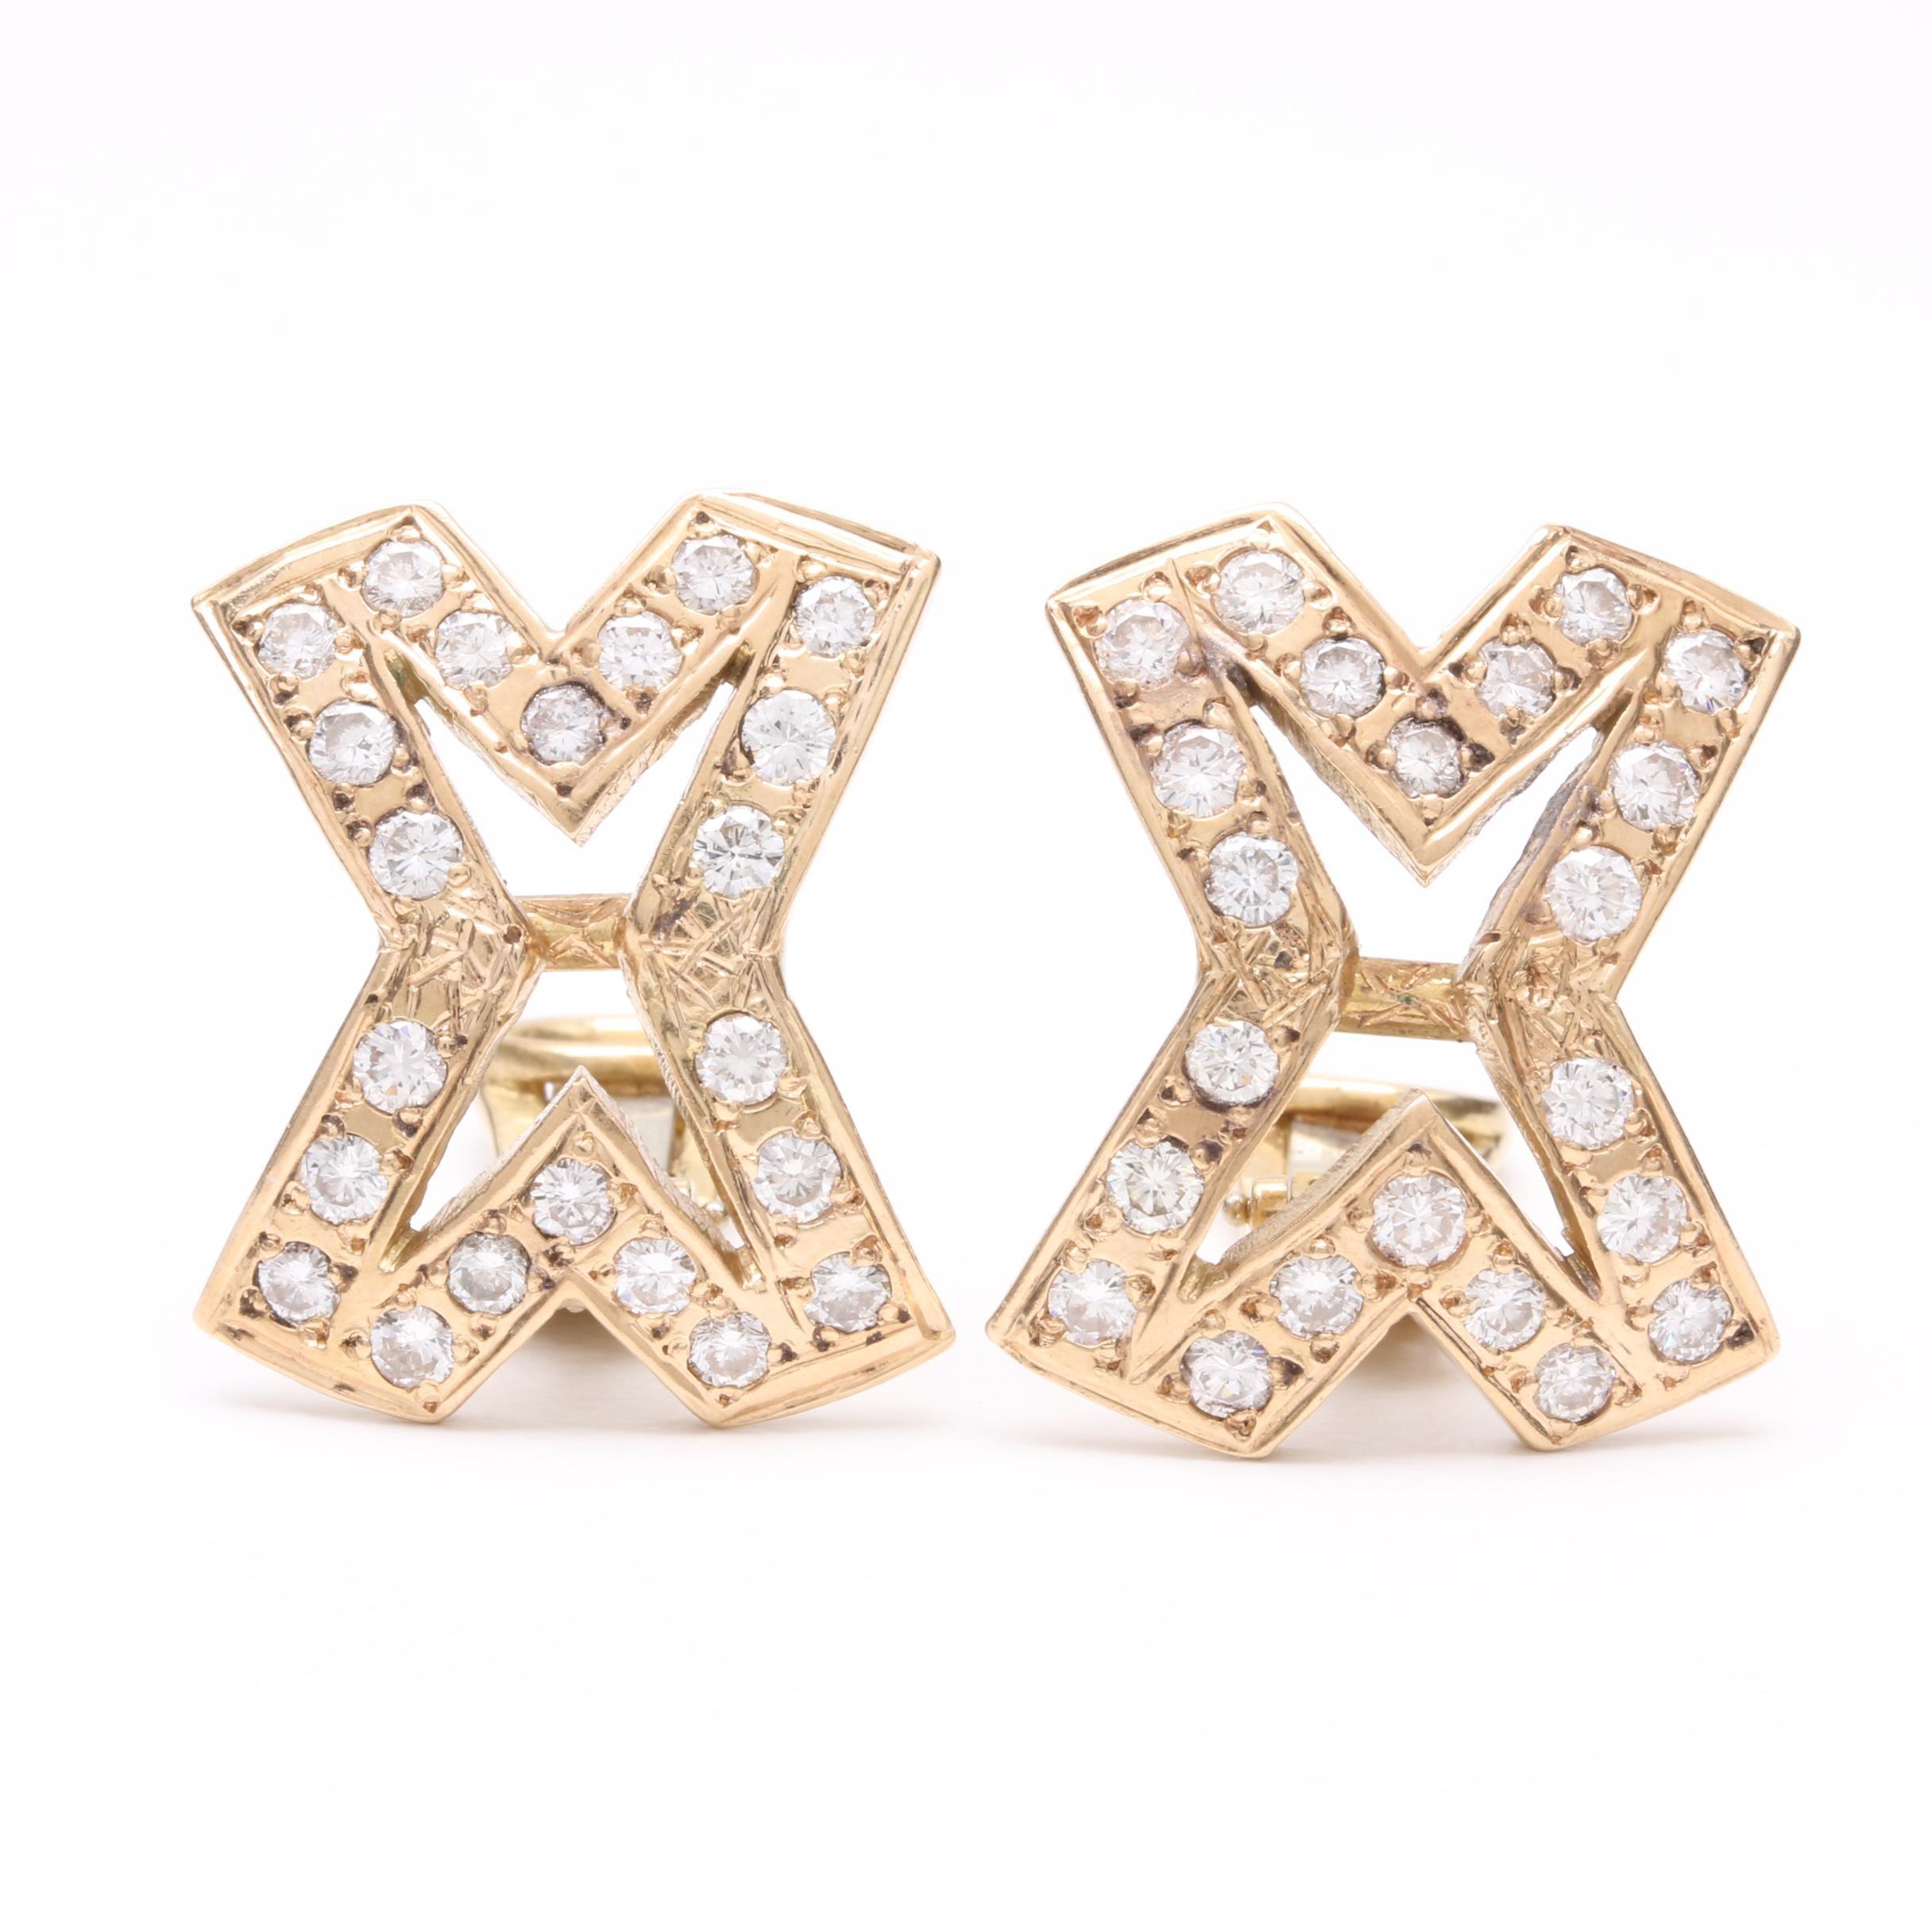 14K and 18K Yellow Gold 2.42 CTW Diamond Earrings